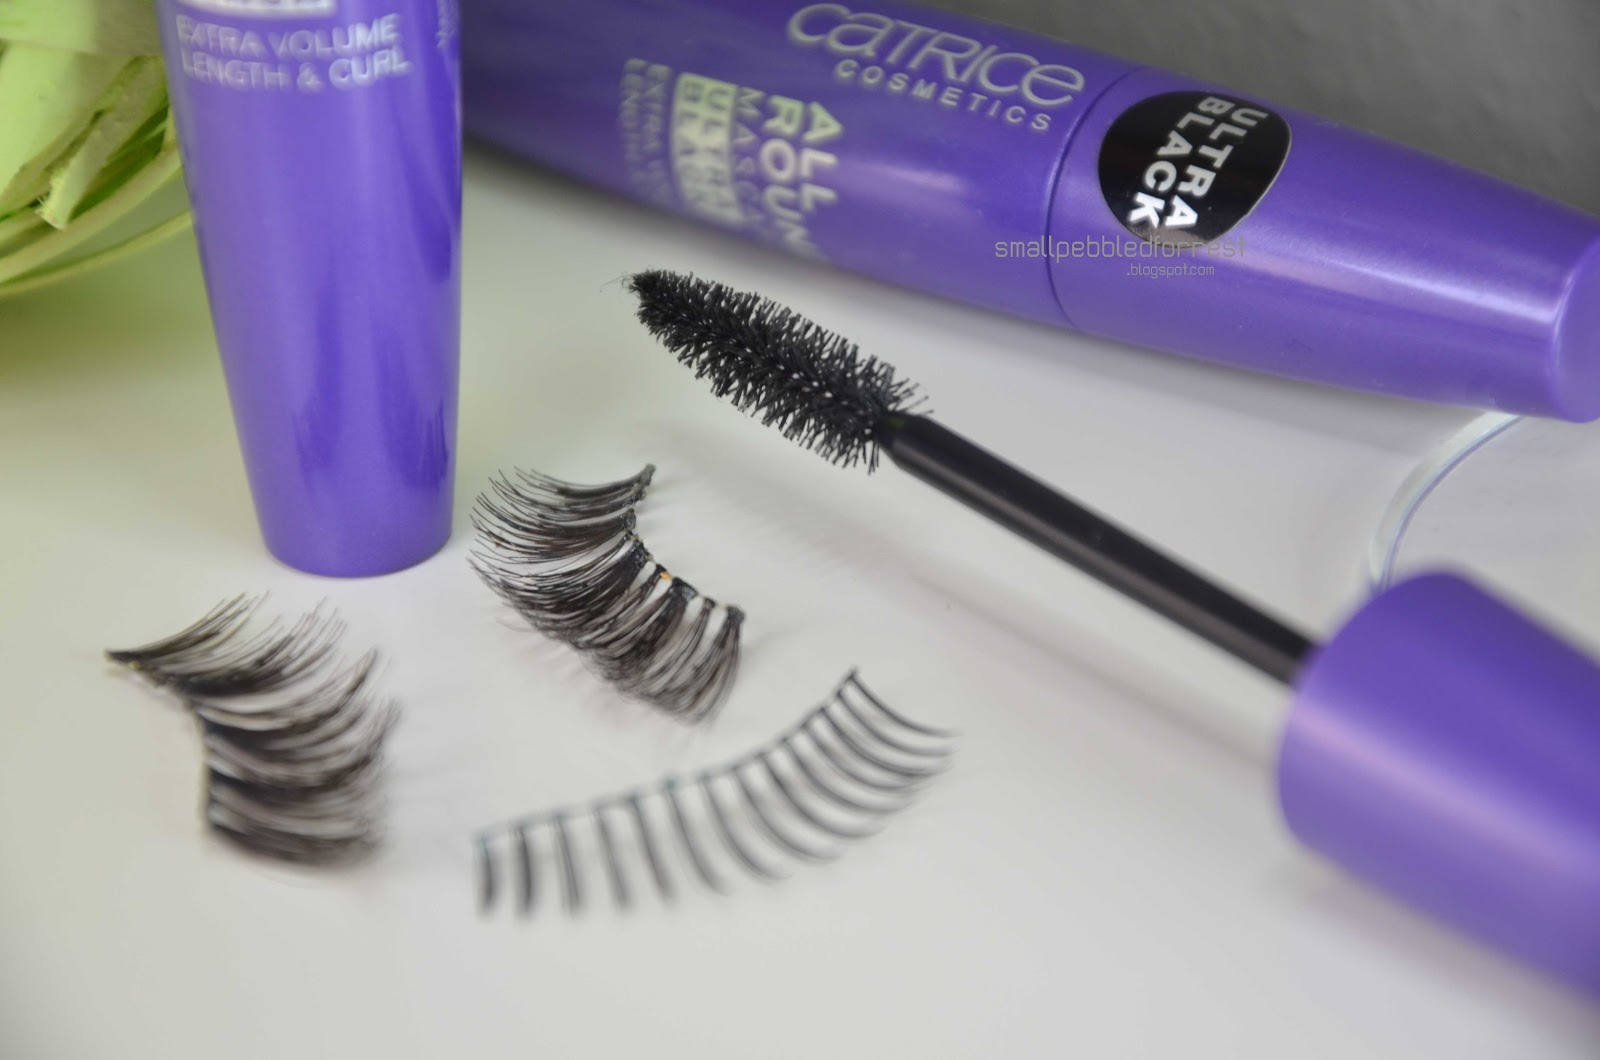 Allround Waterproof Mascara by Catrice Cosmetics #3